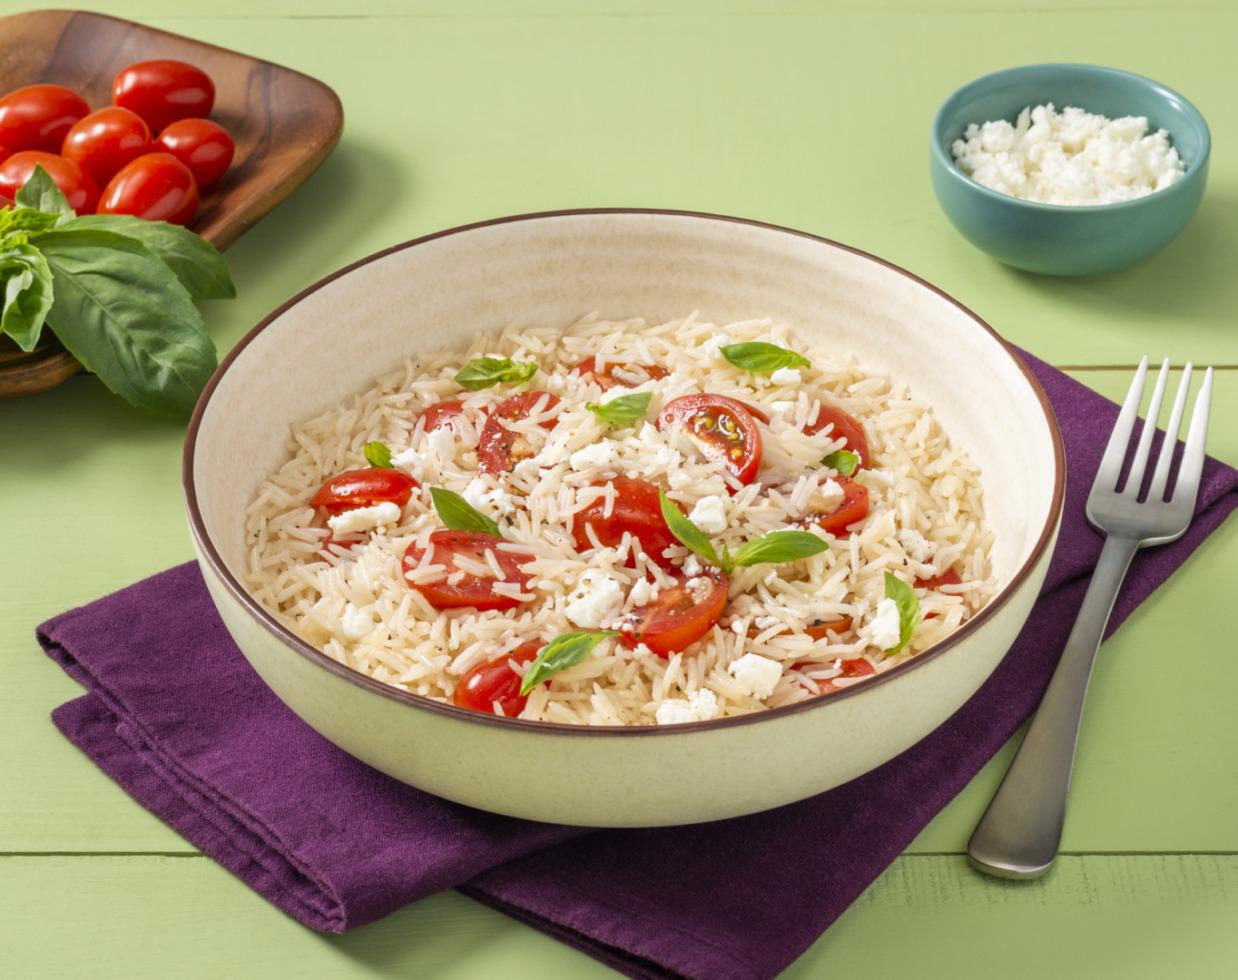 Feta and Tomato Rice